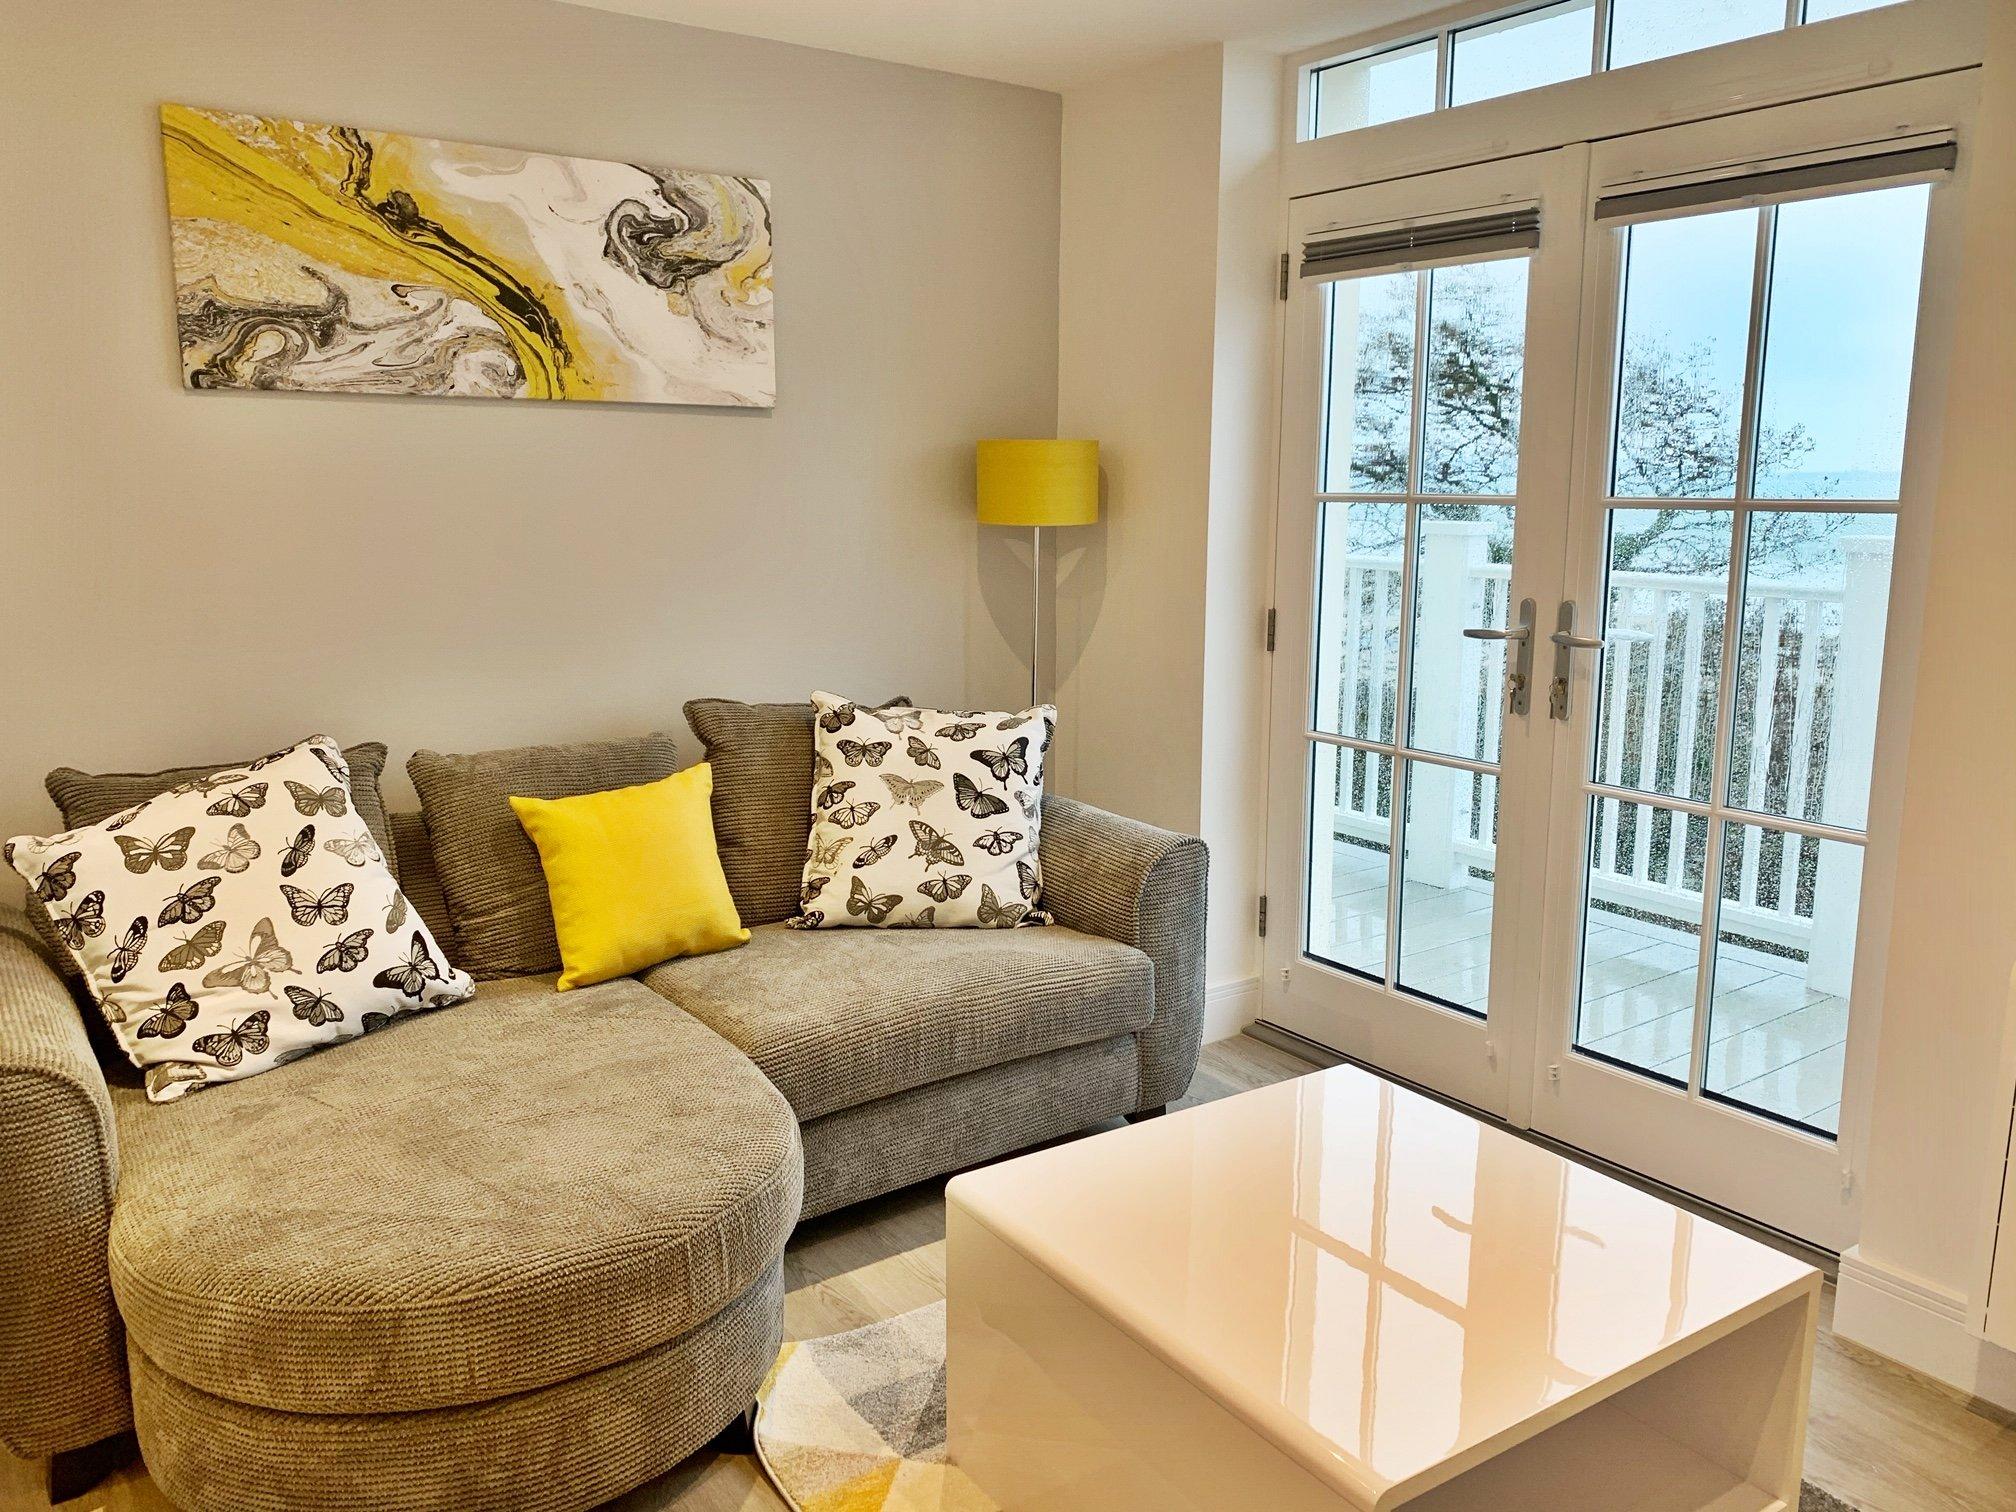 All Residential Status, Studios, 1 & 2 Bedroom Apartments